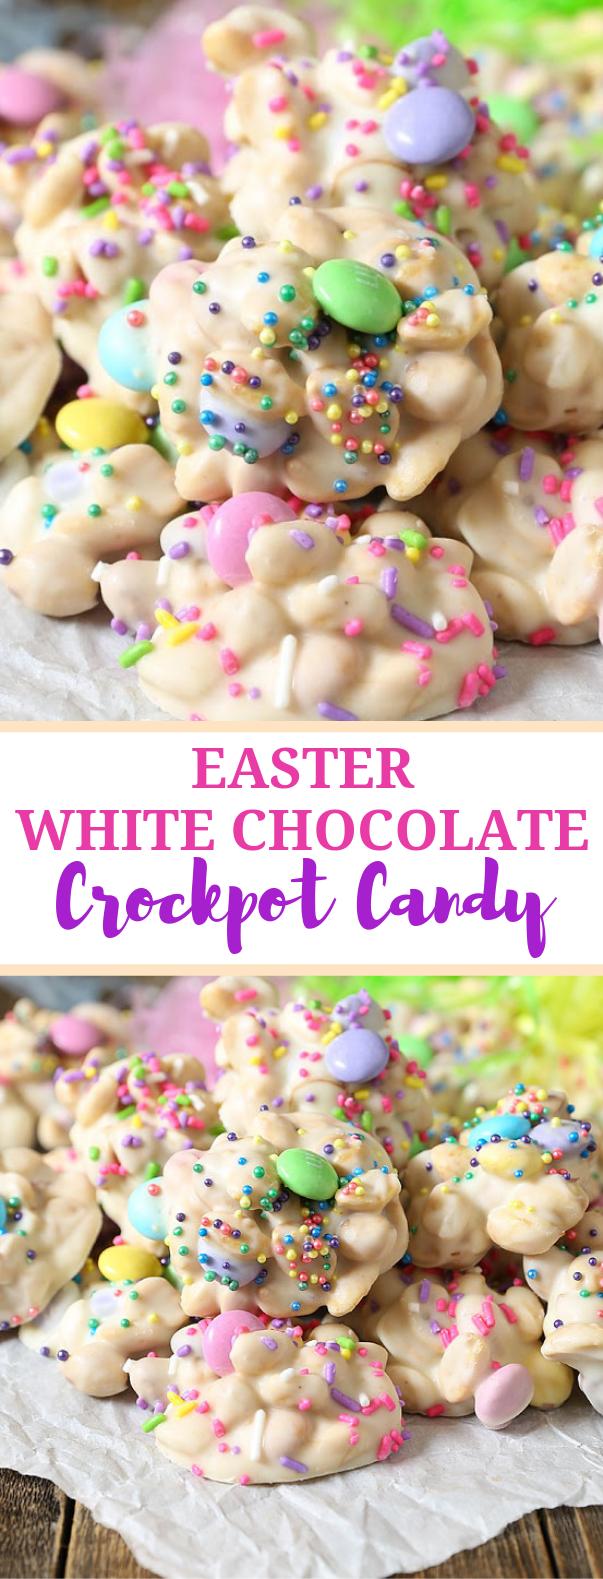 Easter Crockpot Candy #dessert #cluster